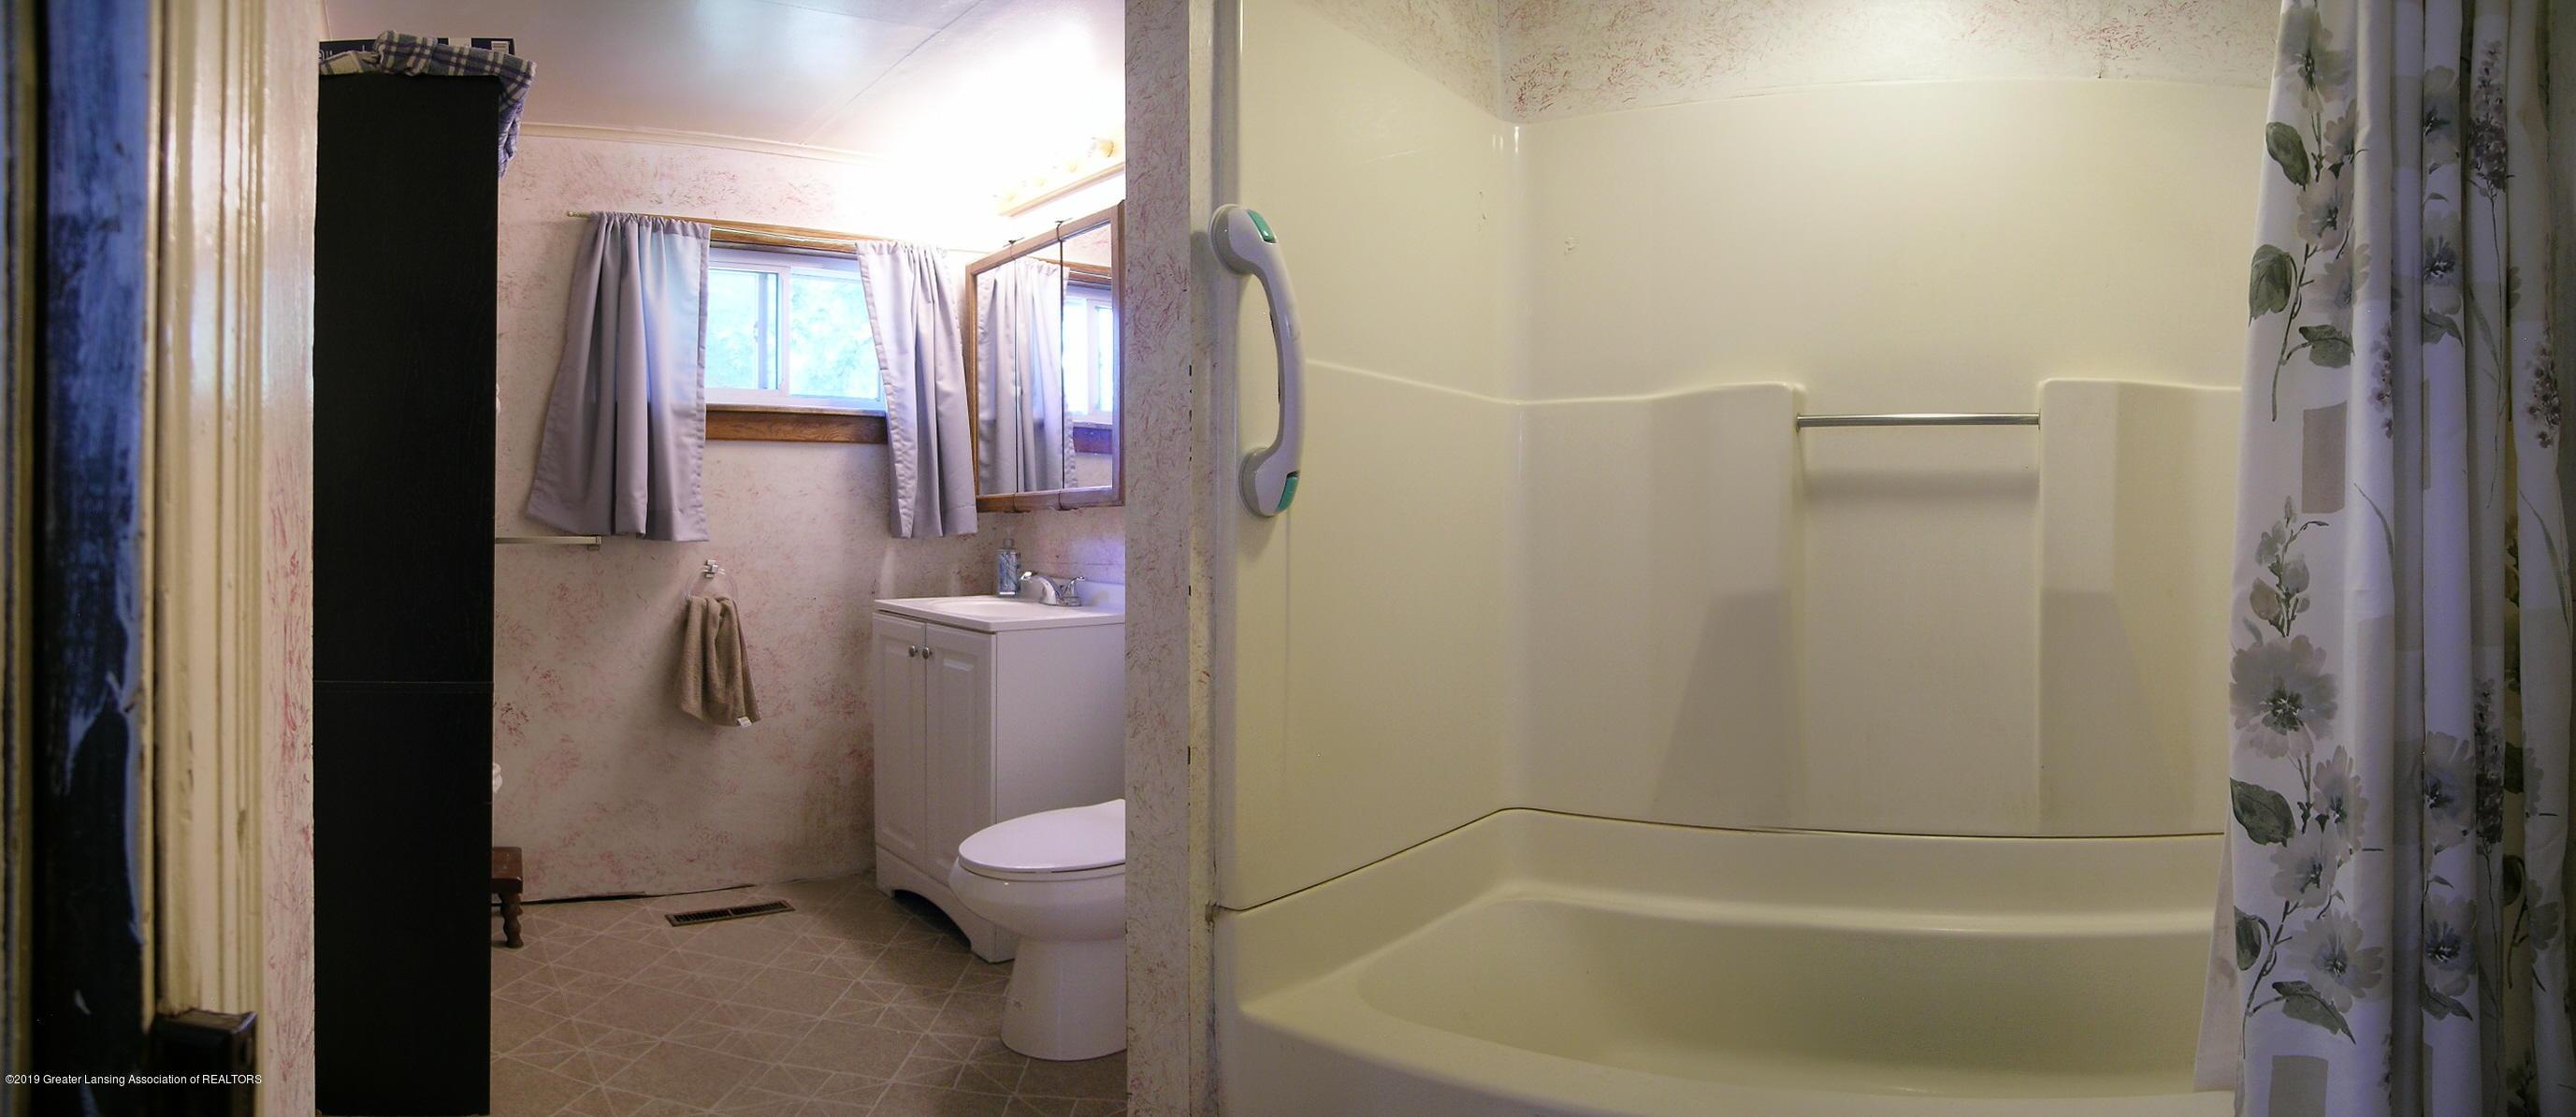 413 W Shepherd St - Bathroom - 9